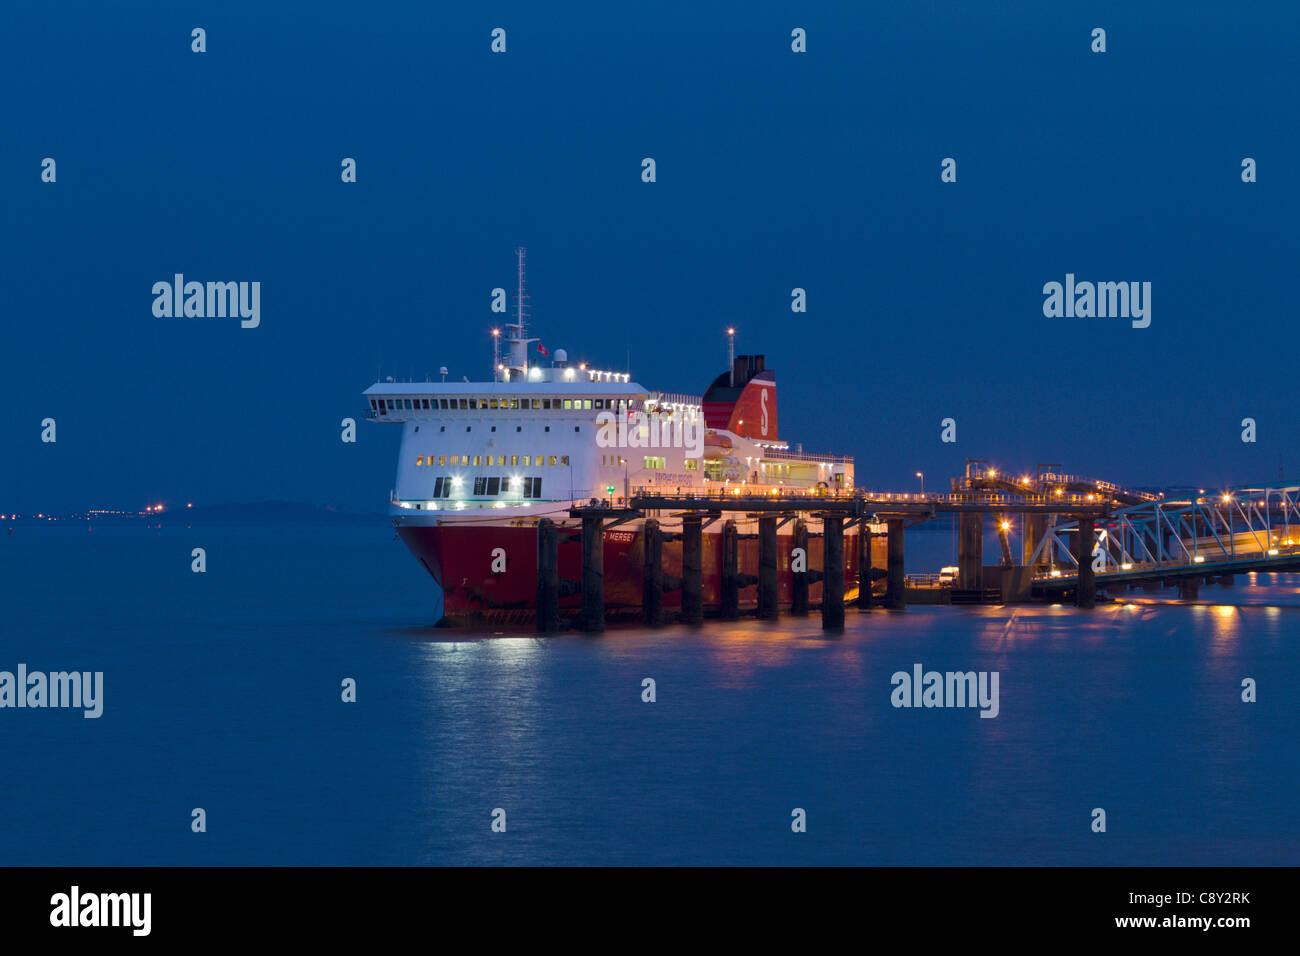 Liverpool to Belfast ferry at Birkenhead - Stock Image